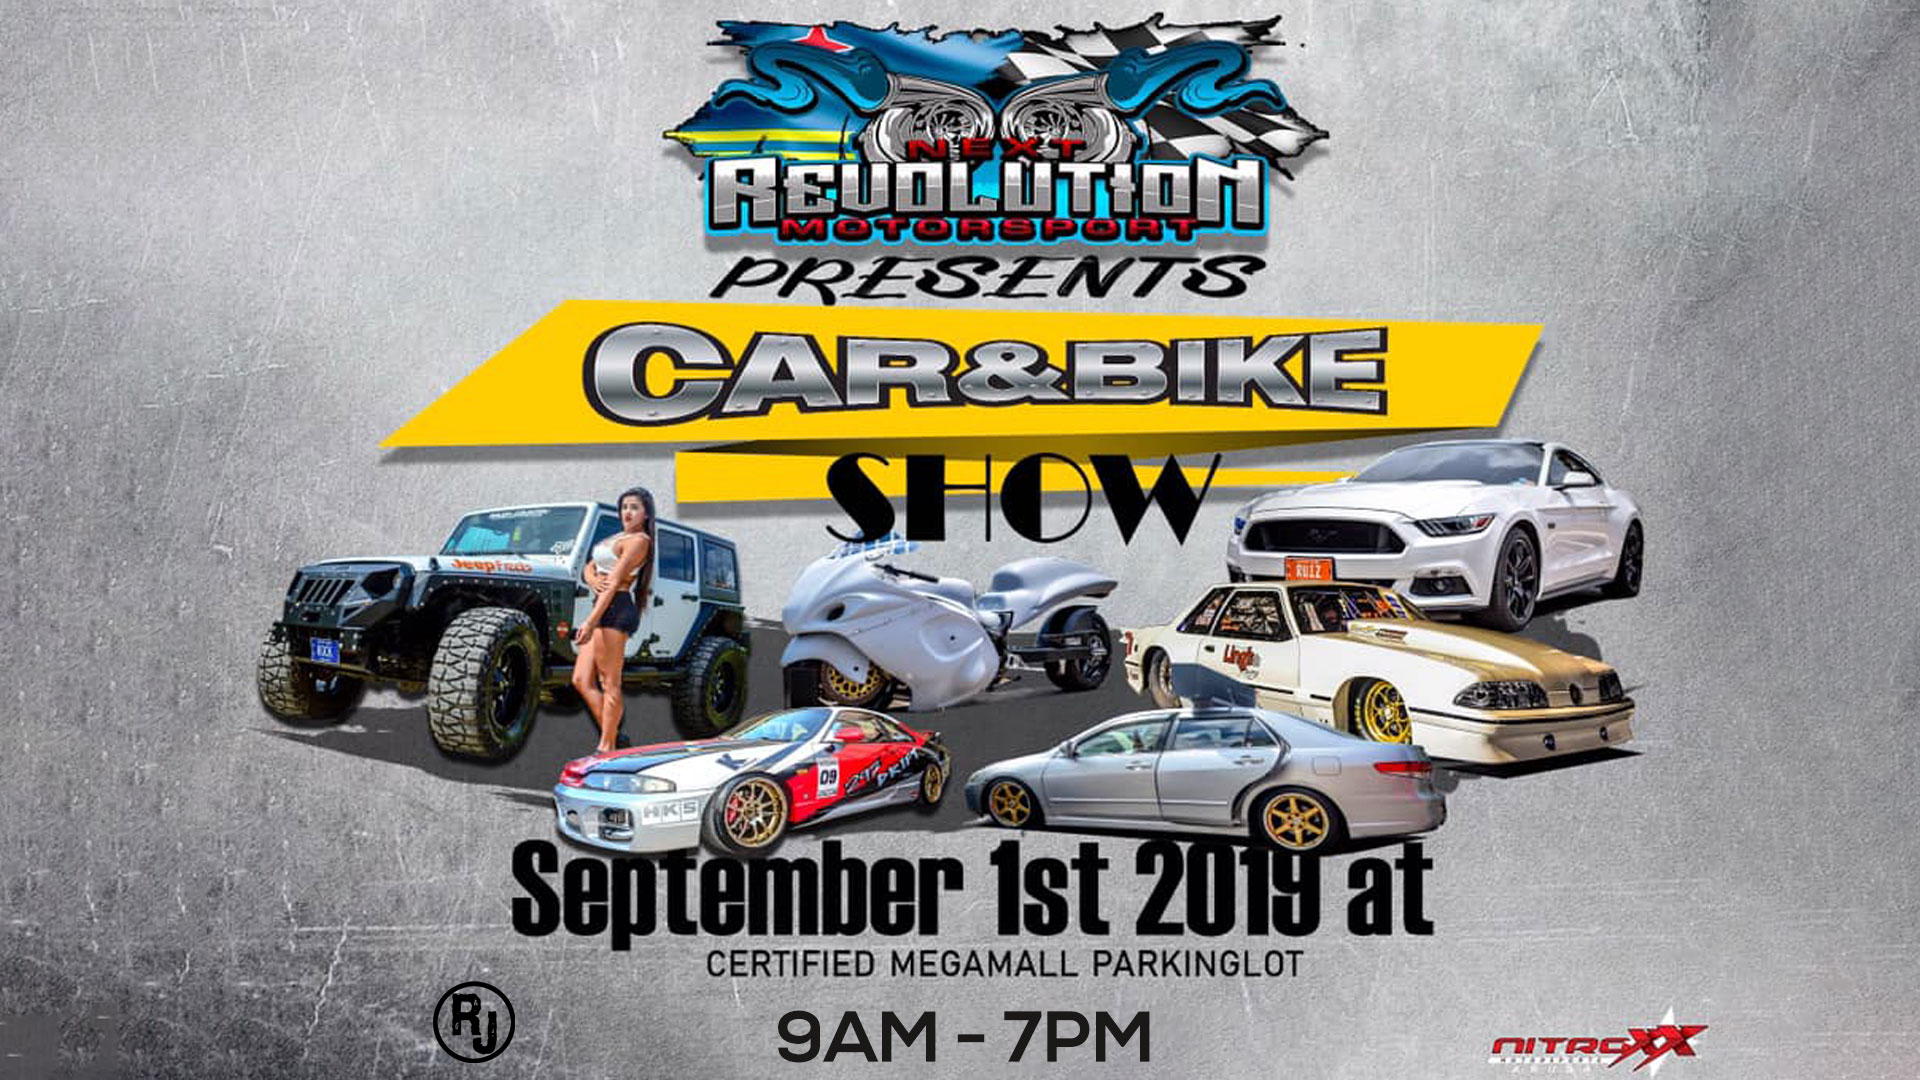 Car & Bike Show by Next Revolution Motorsports